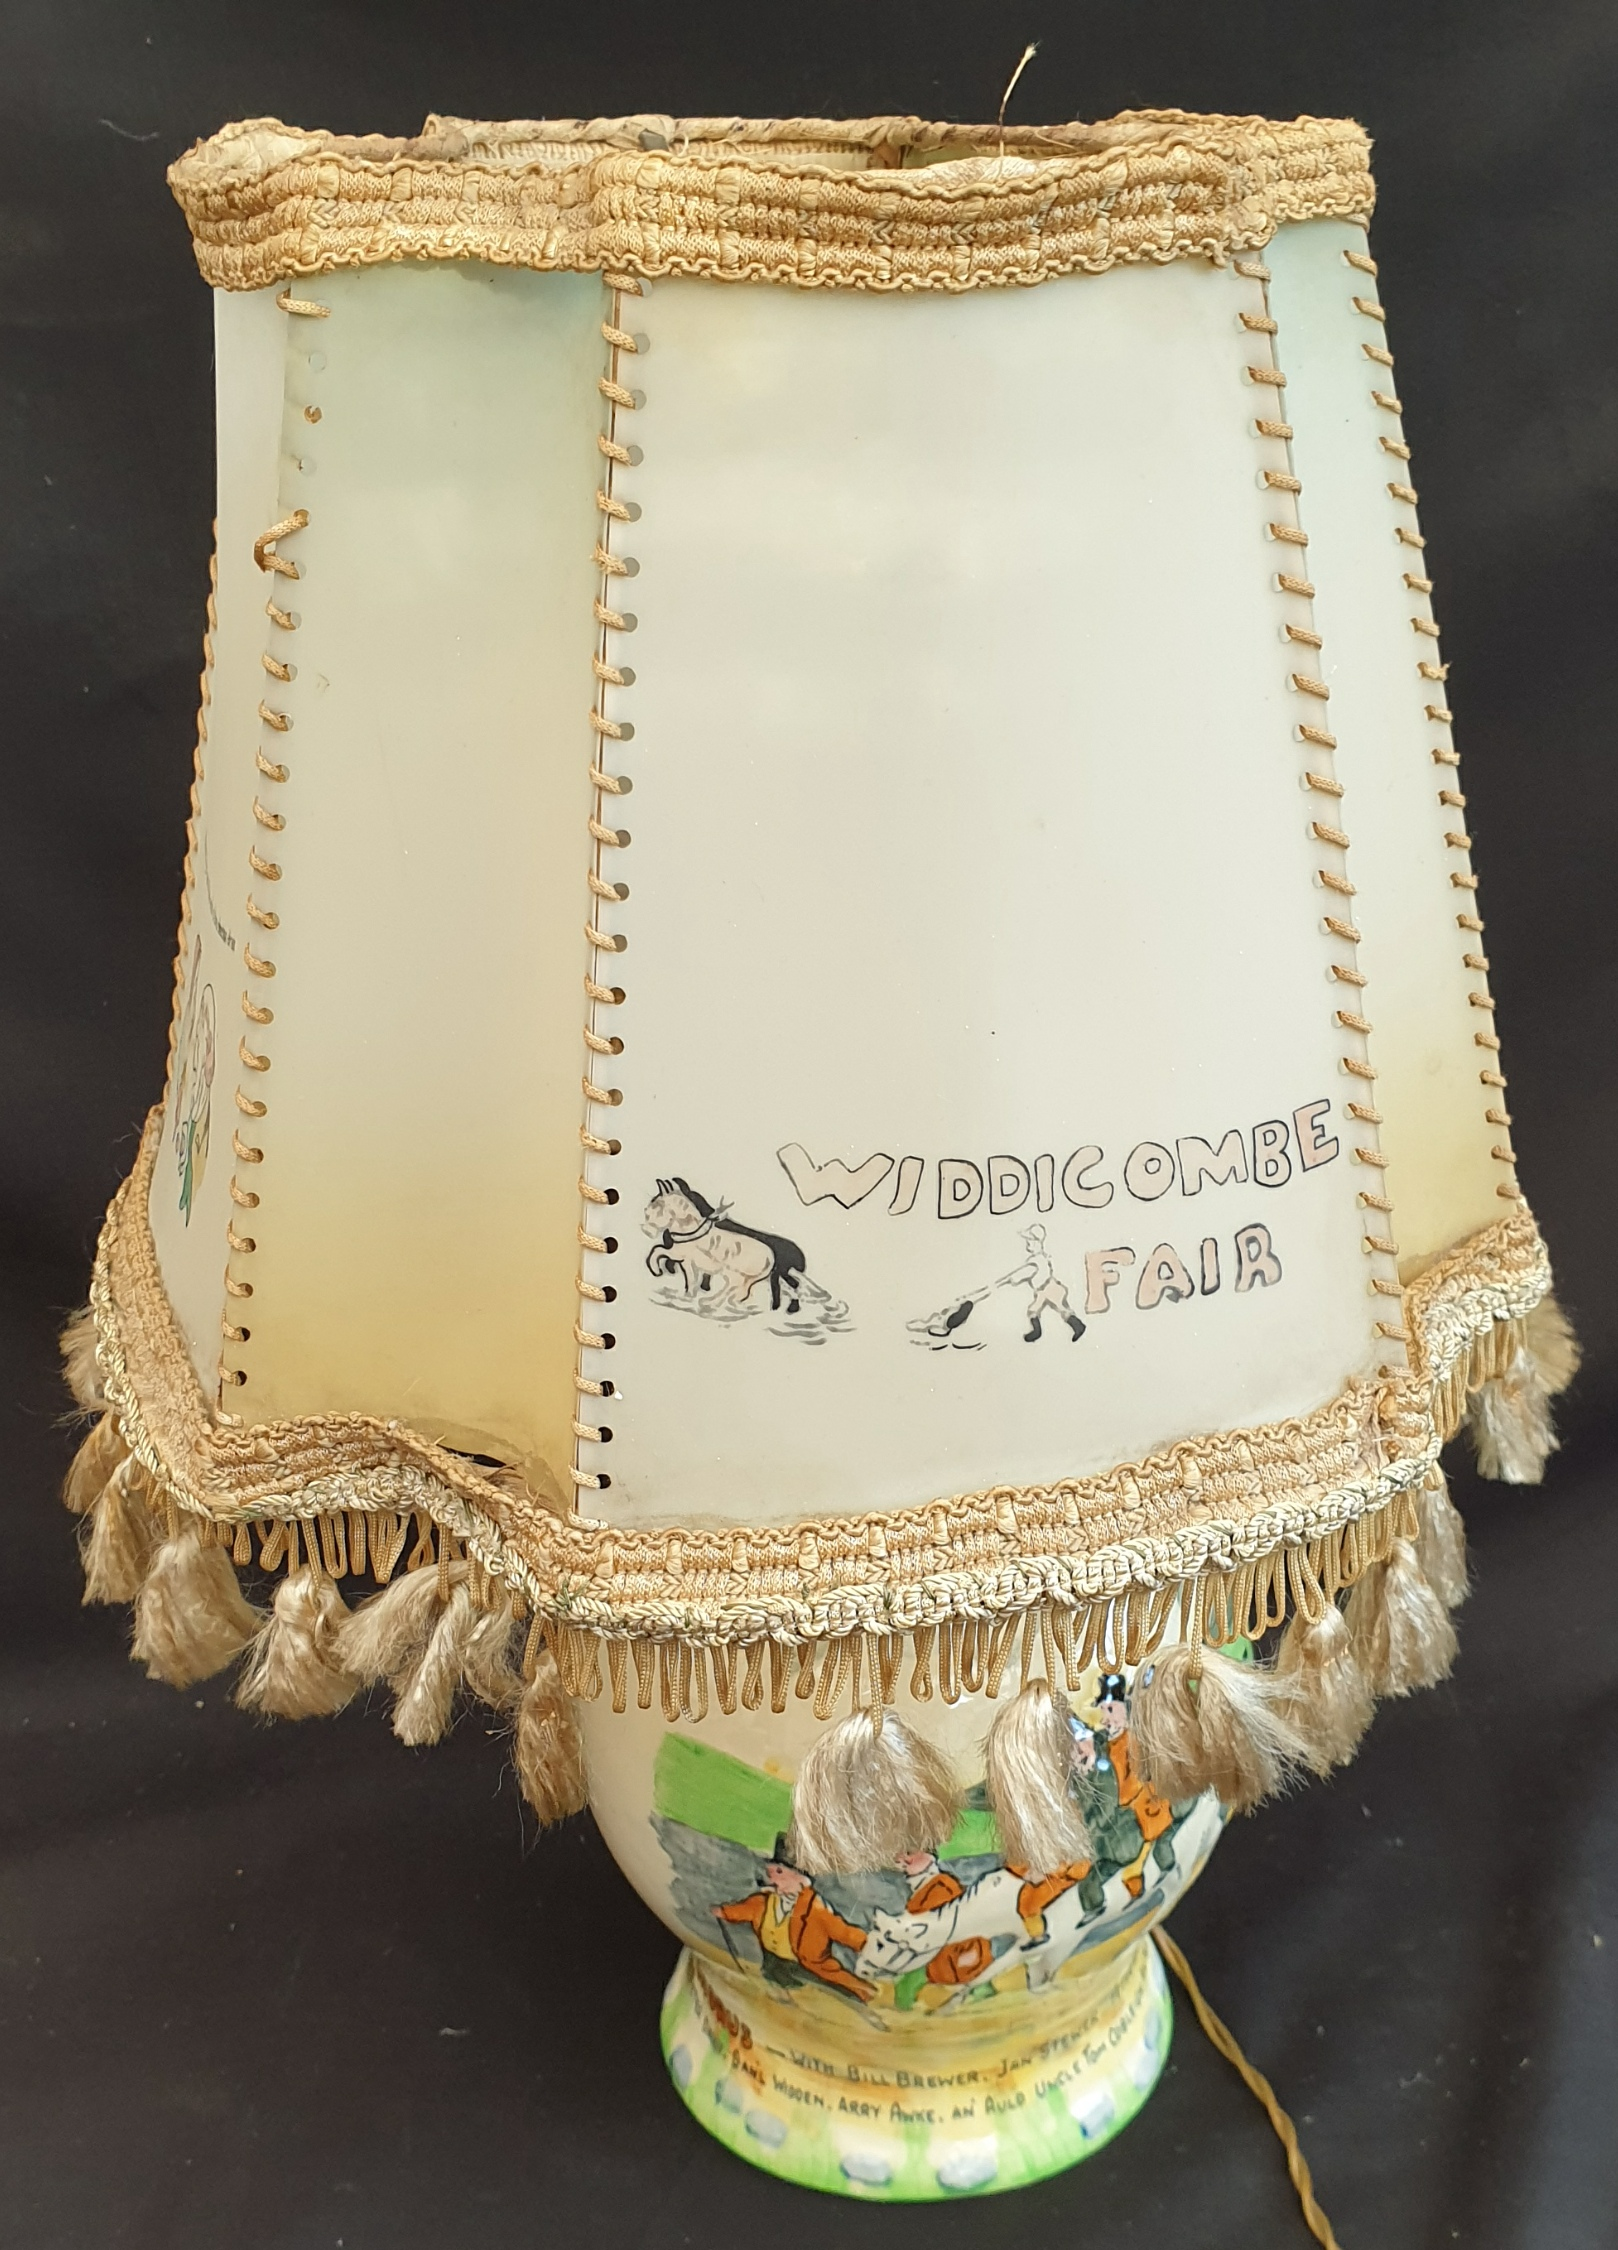 Antique Crown Devon Fieldings Widdecombe Fair Table Lamp Original Shade - Image 3 of 4